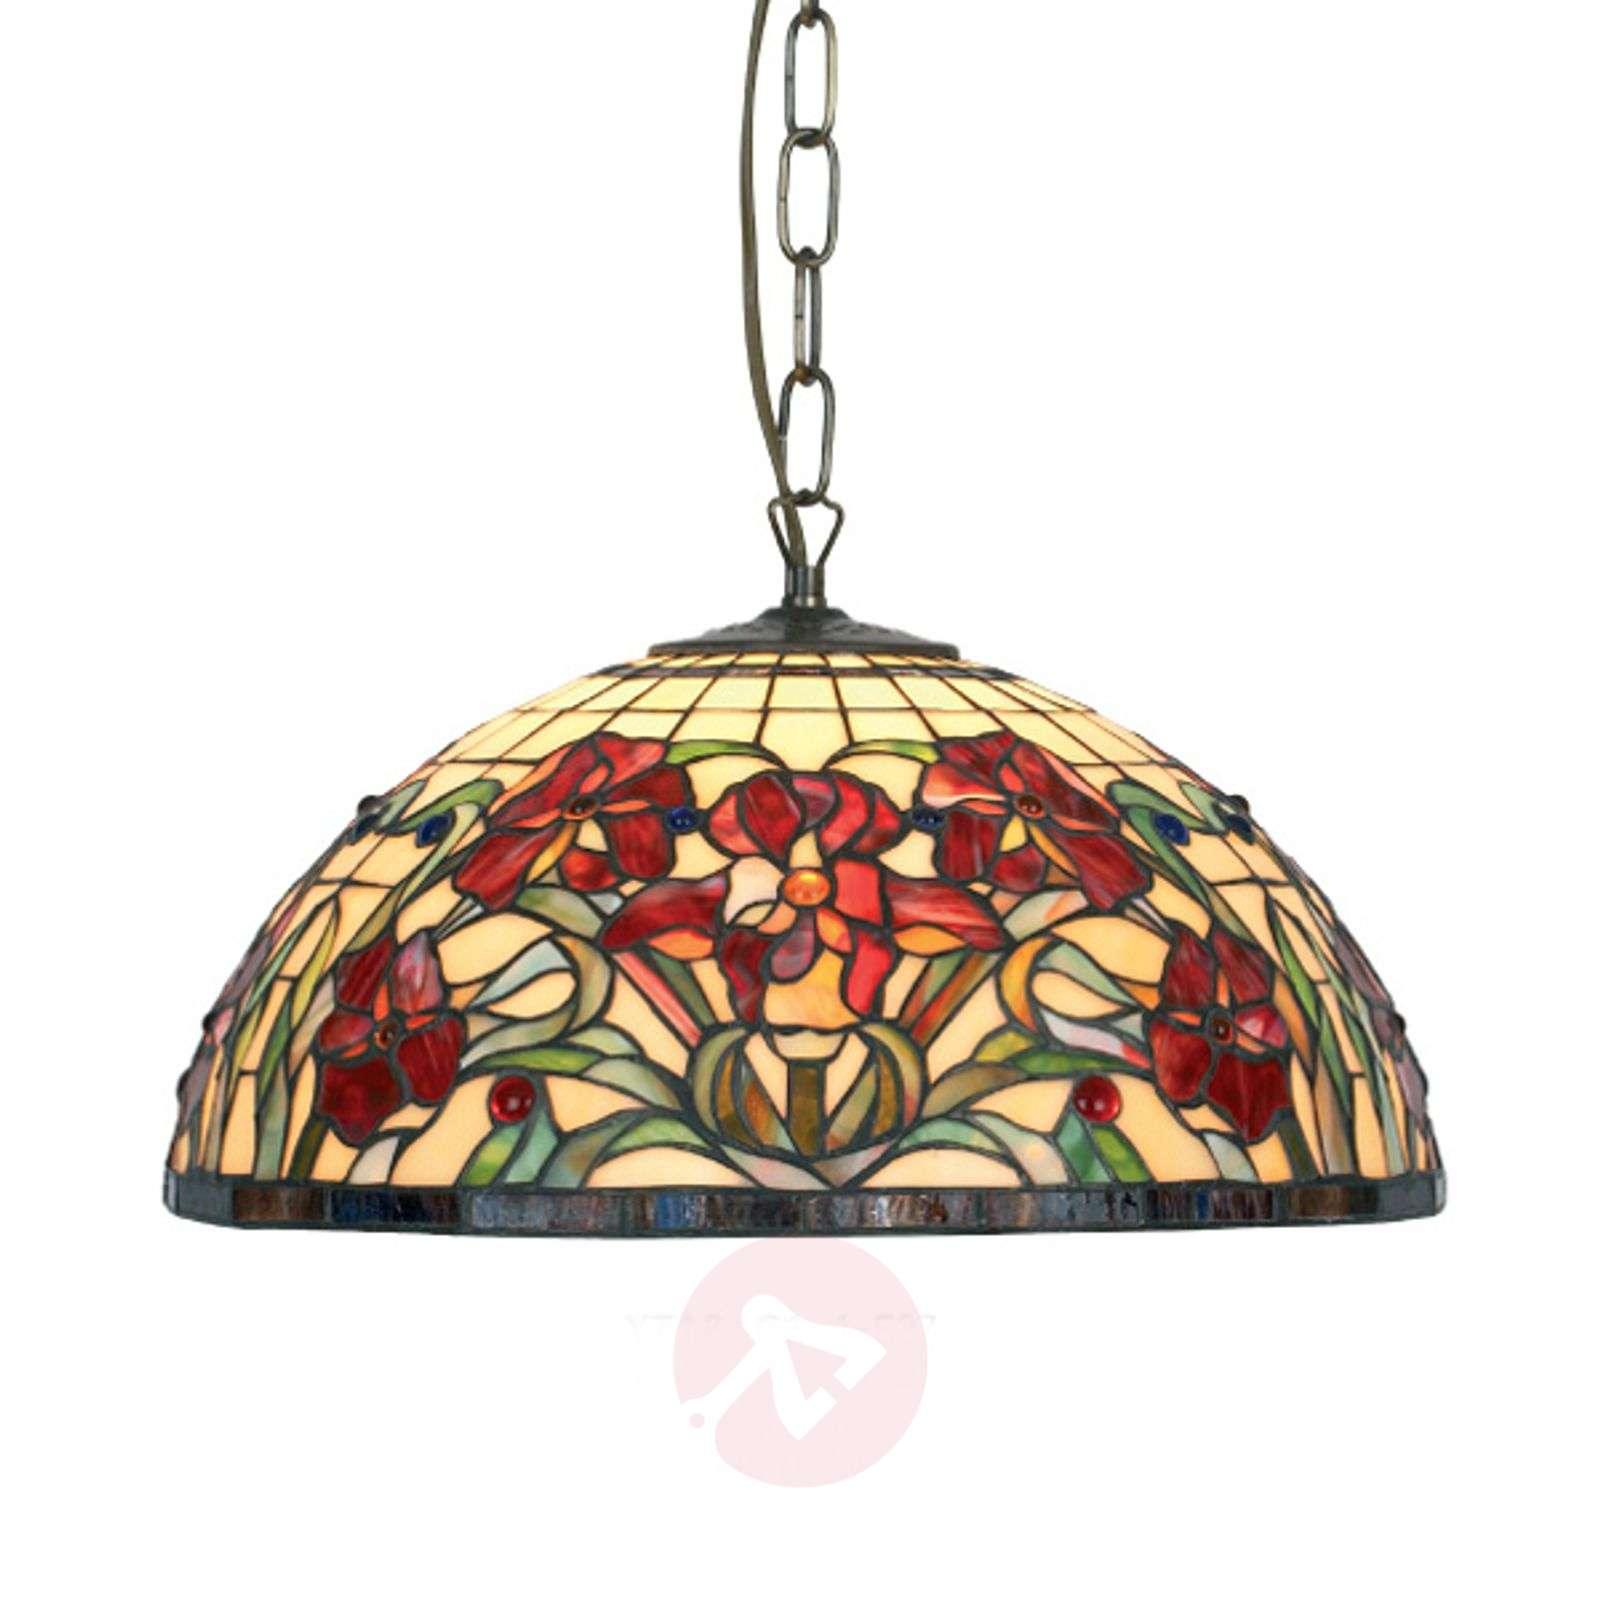 Classic hanging light ELINE-1032166X-01